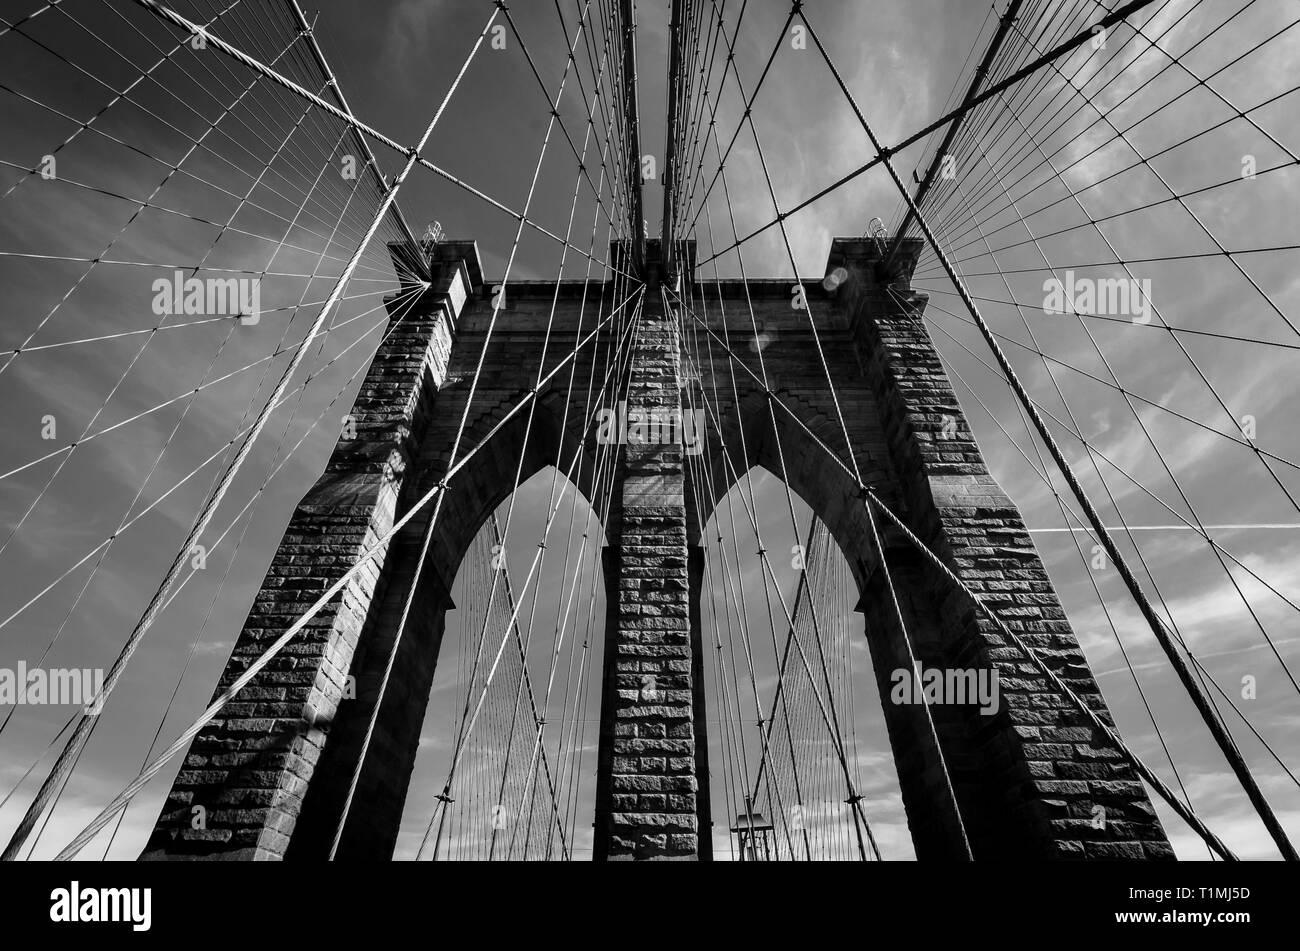 Brooklyn bridge on a cloudy day - Stock Image